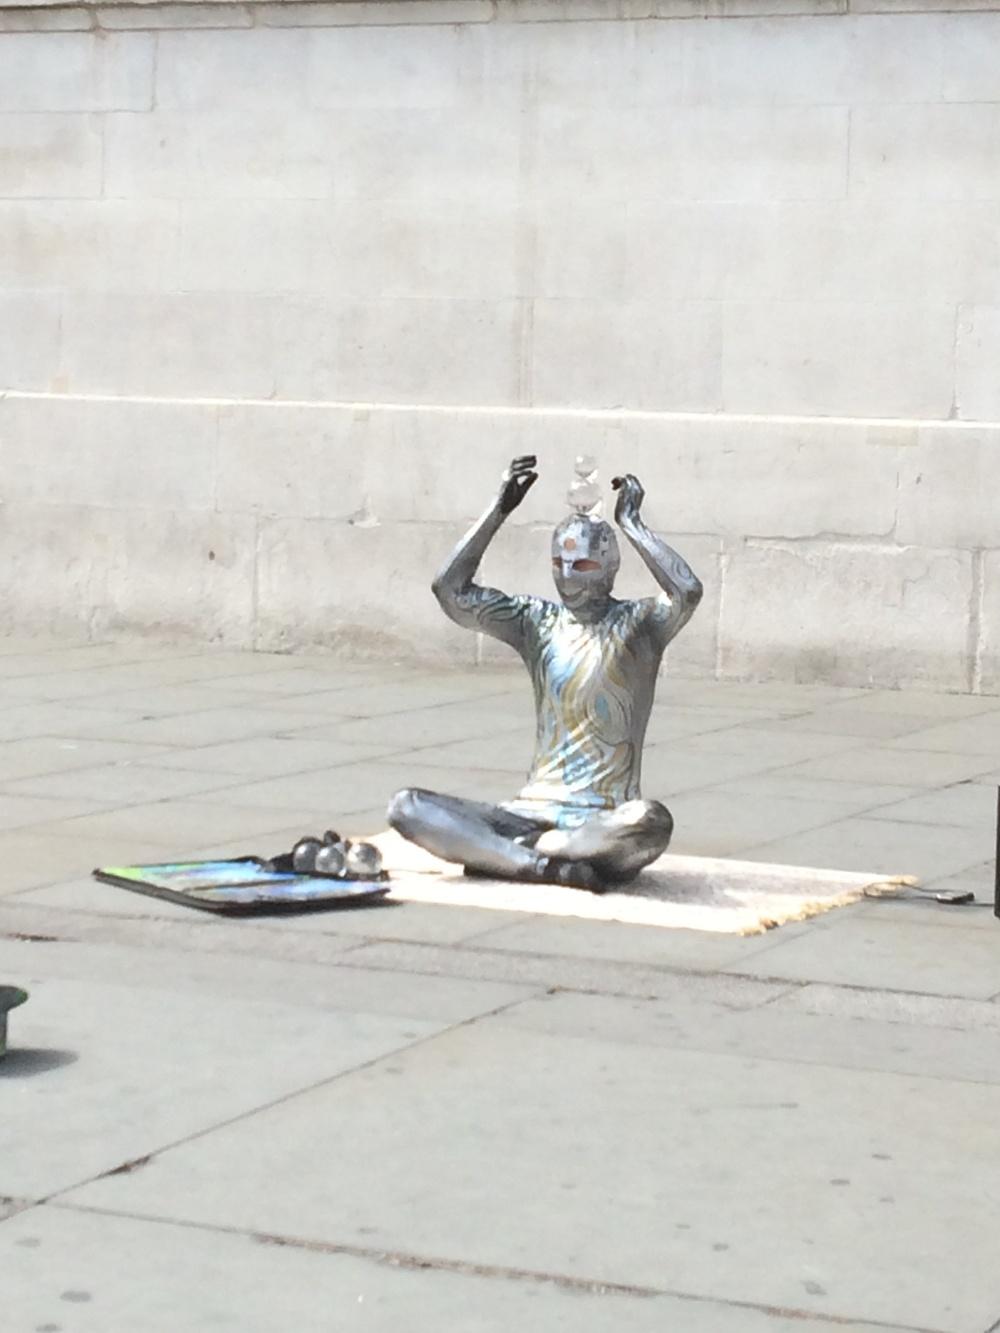 Street performer at Trafalgar Square